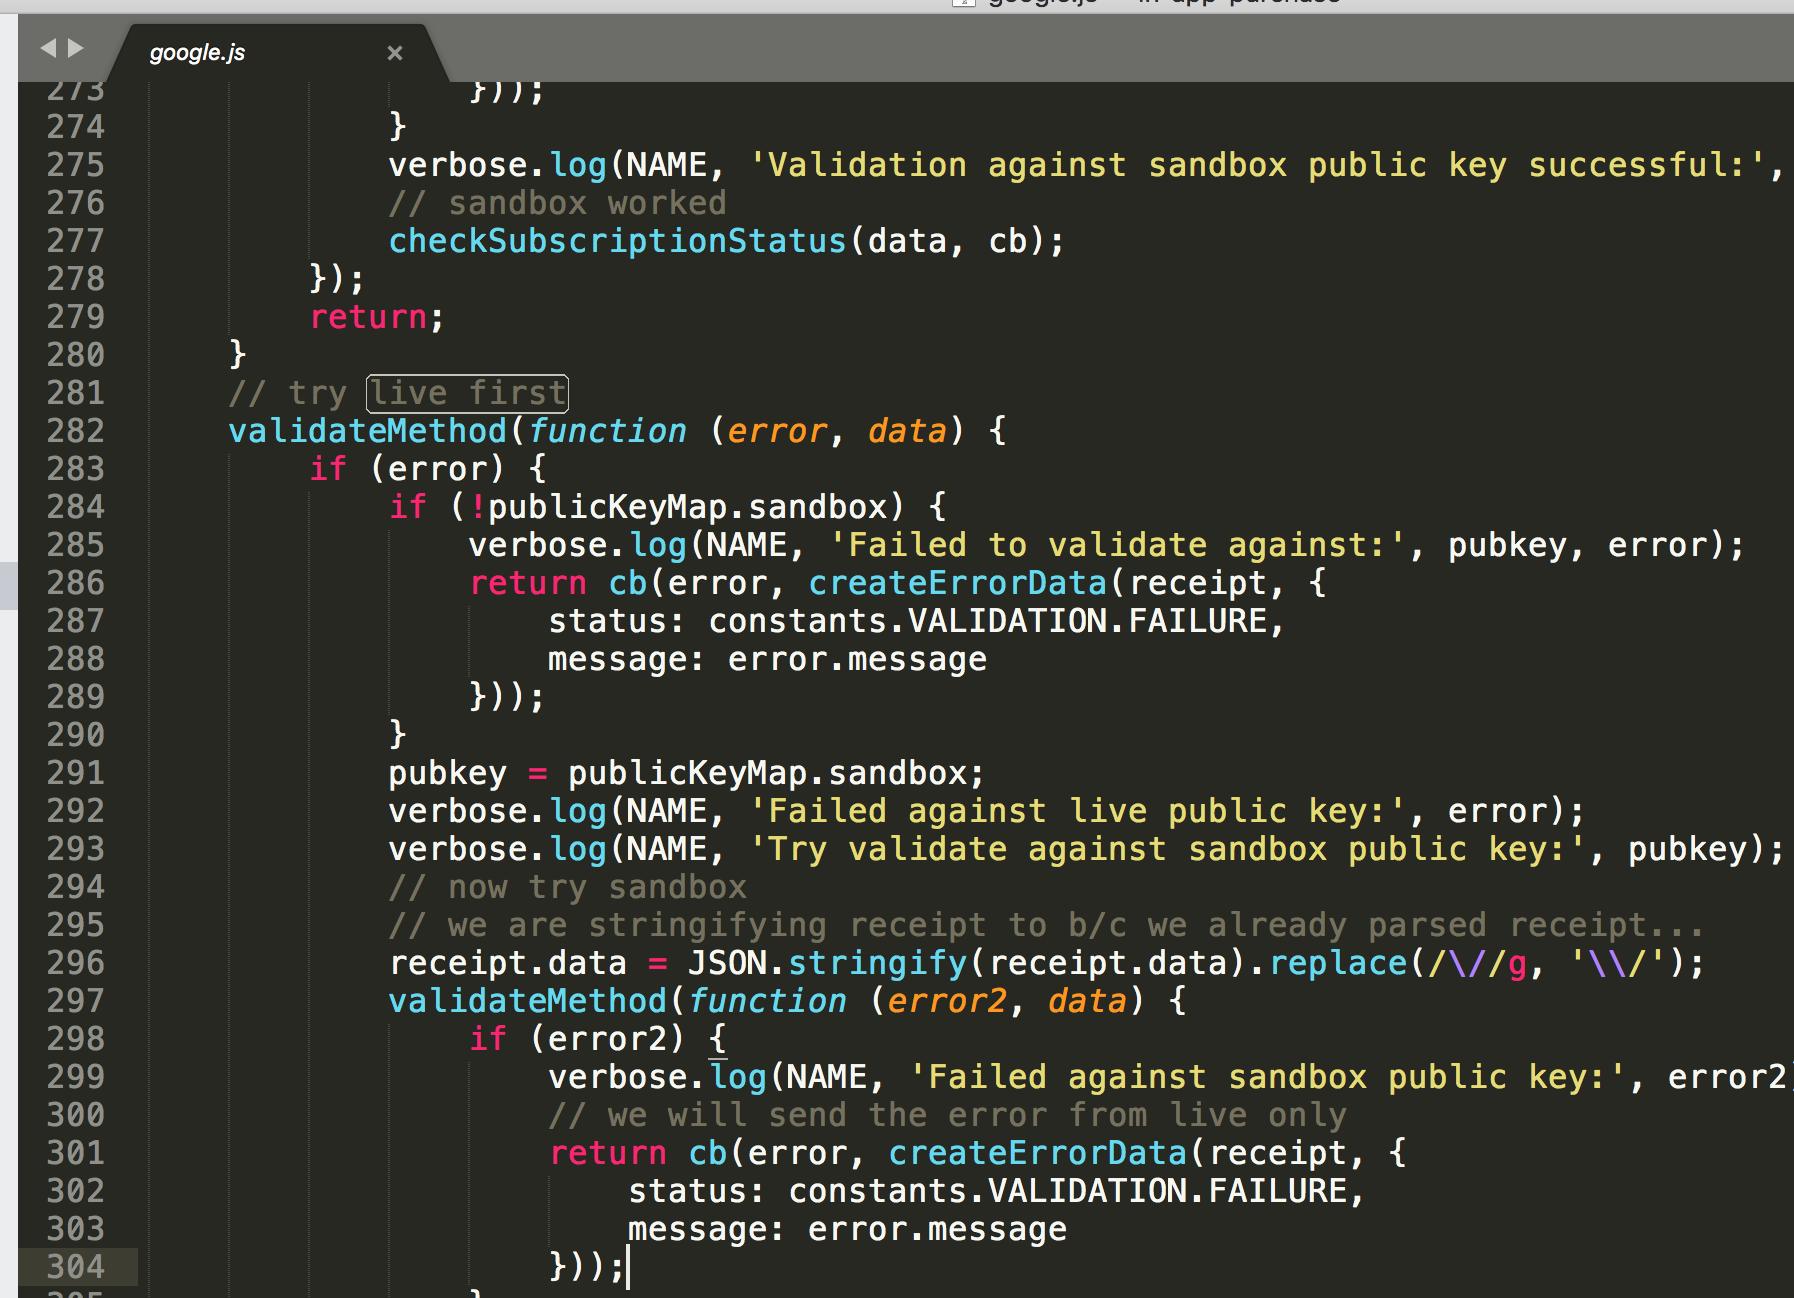 loss error info in google-play · Issue #243 · voltrue2/in-app